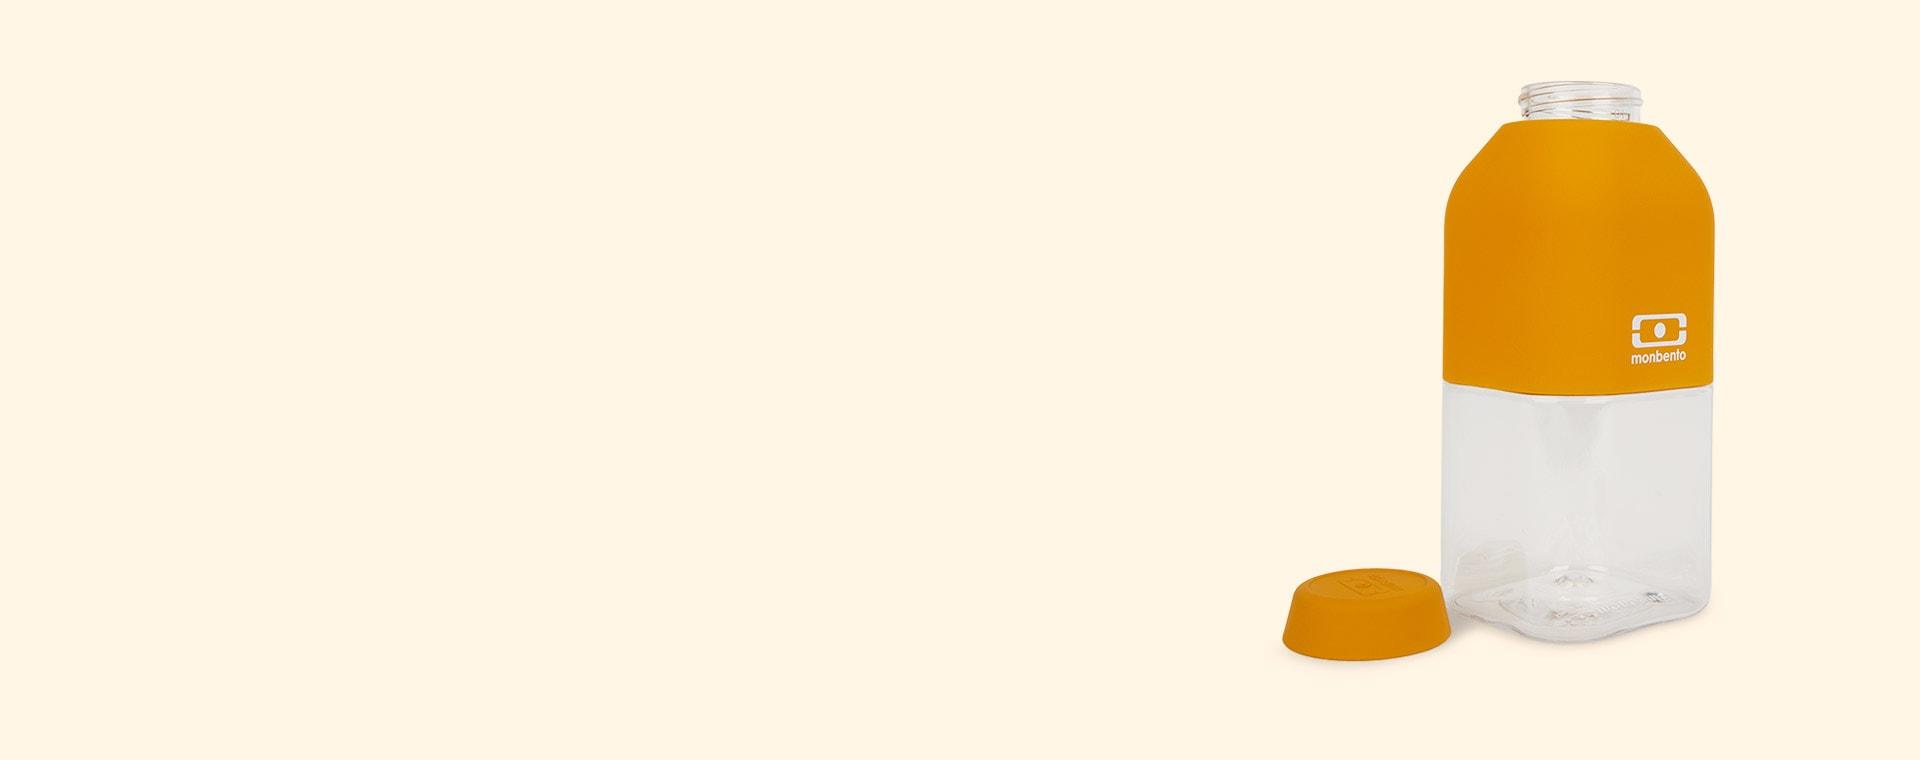 Yellow Moutarde monbento Positive 330ml Bottle